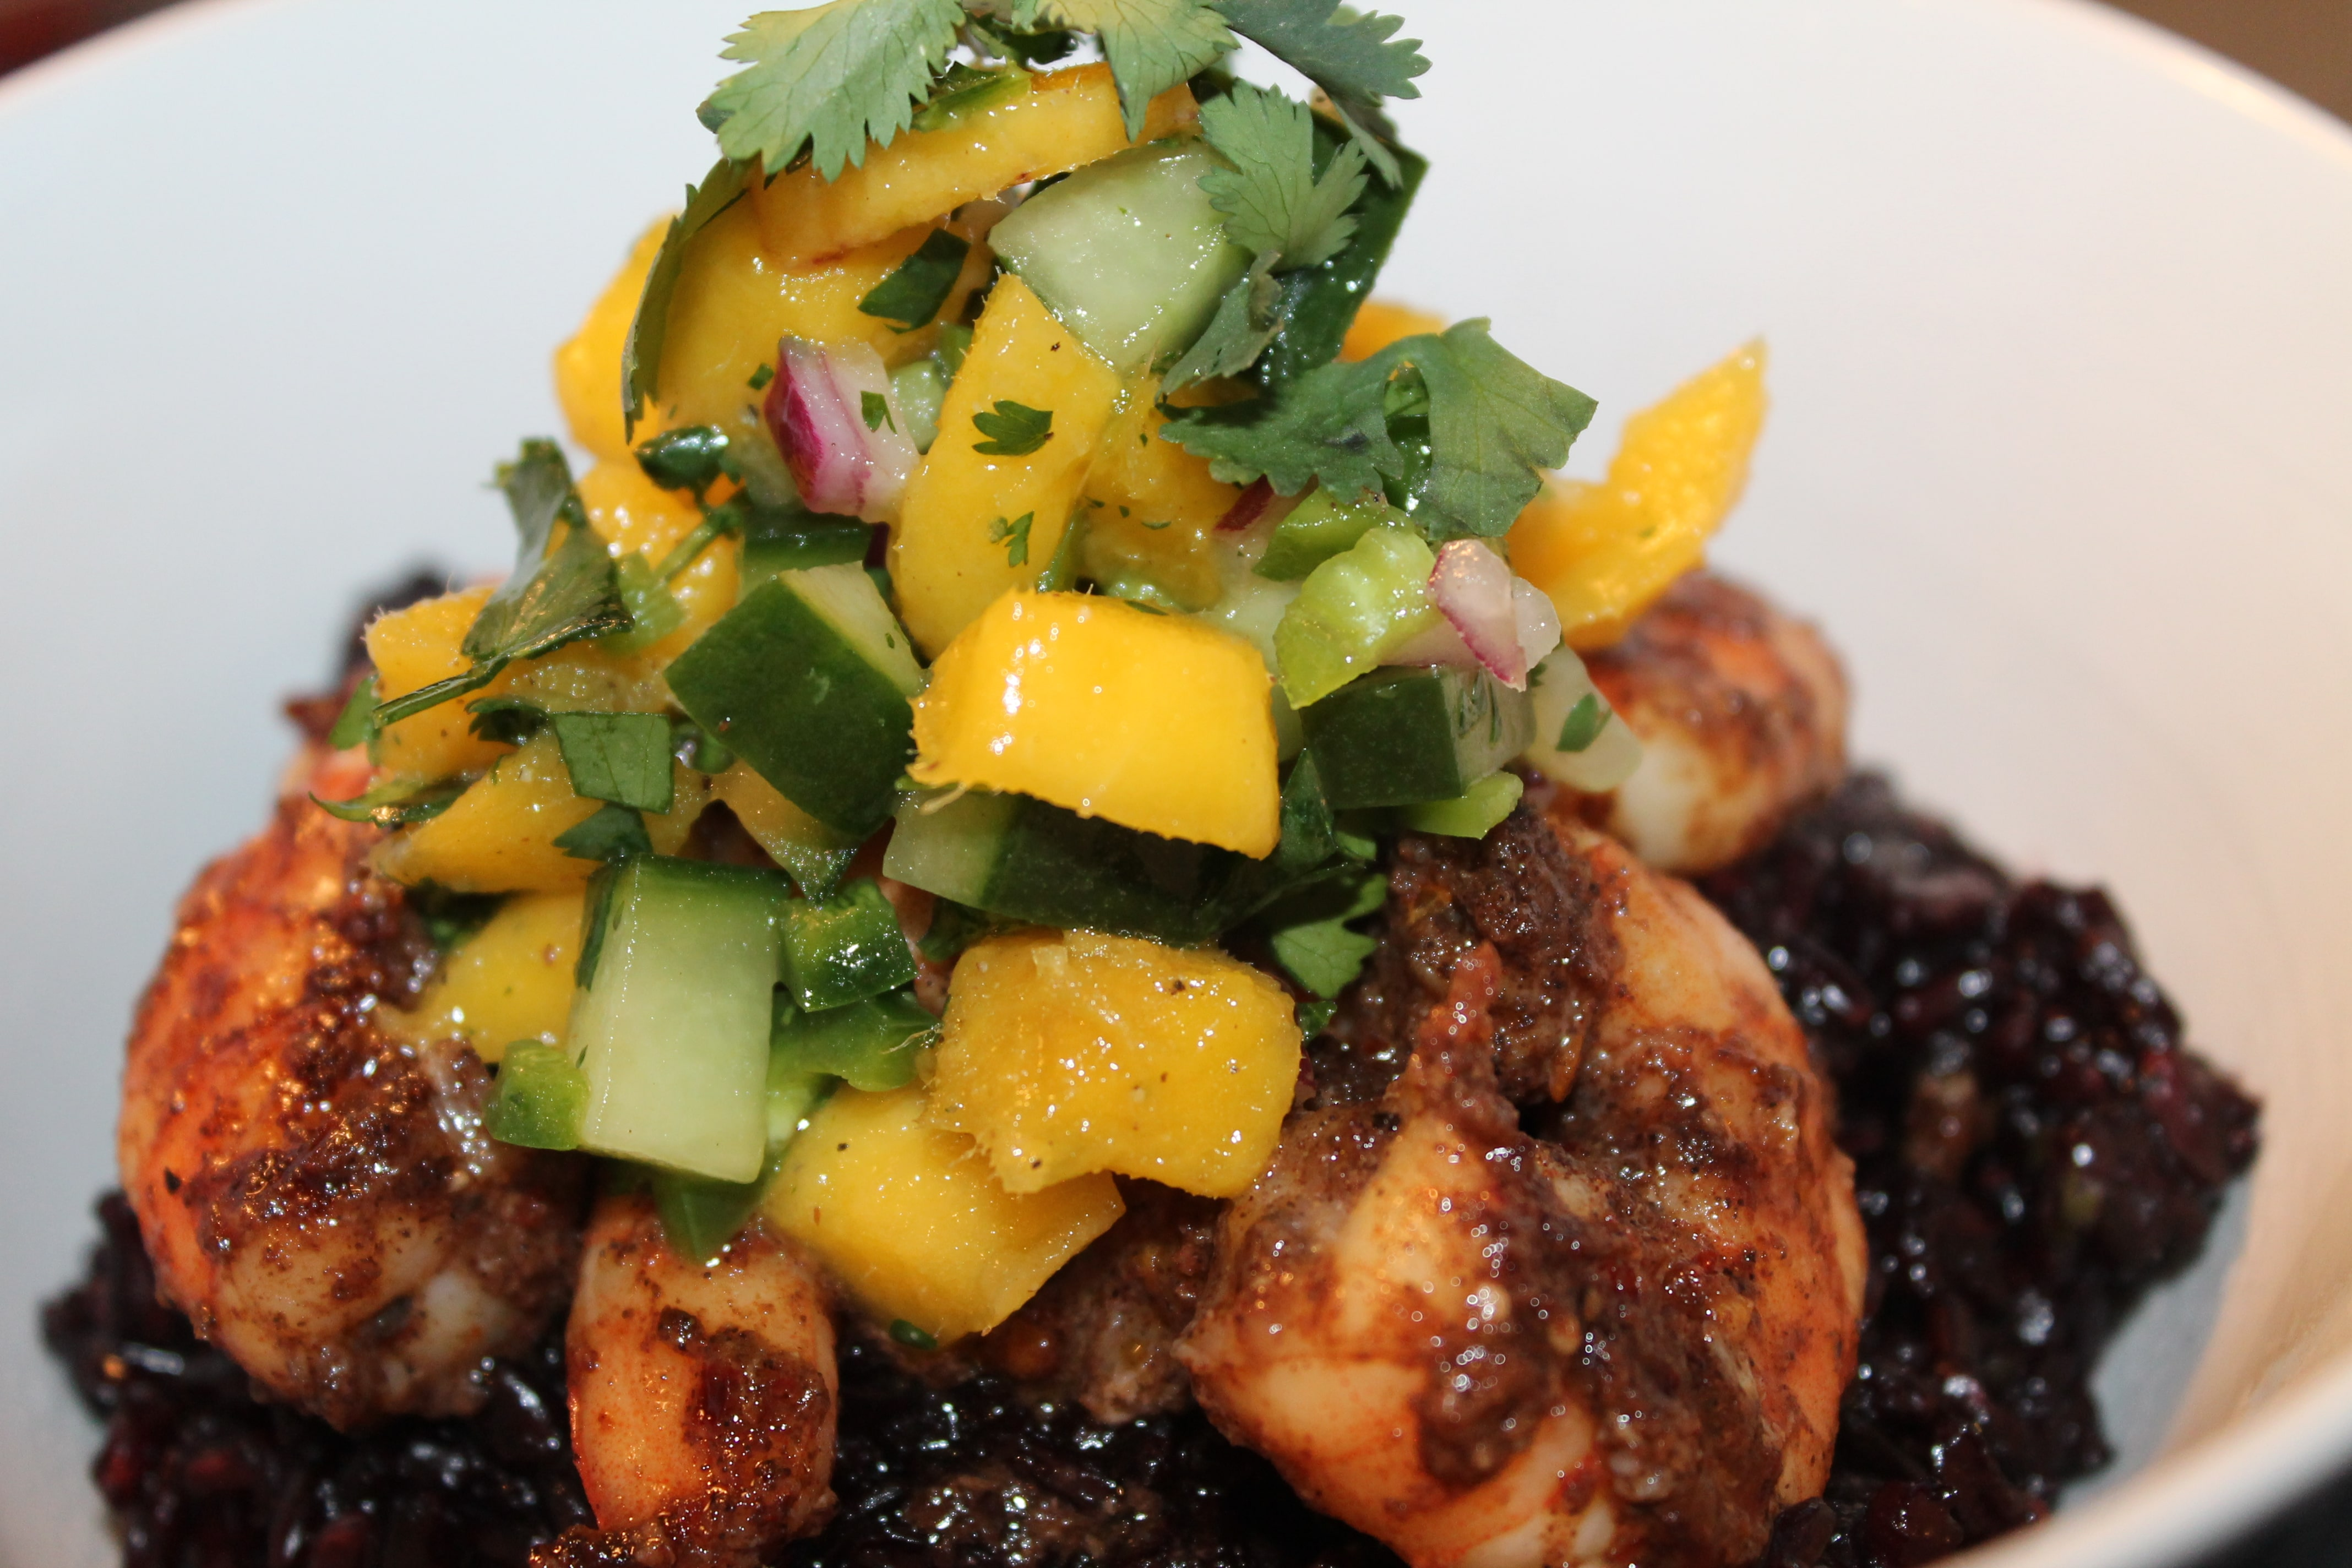 Jerk Shrimp Bowls with Black Rice and Mango Cucumber Salsa